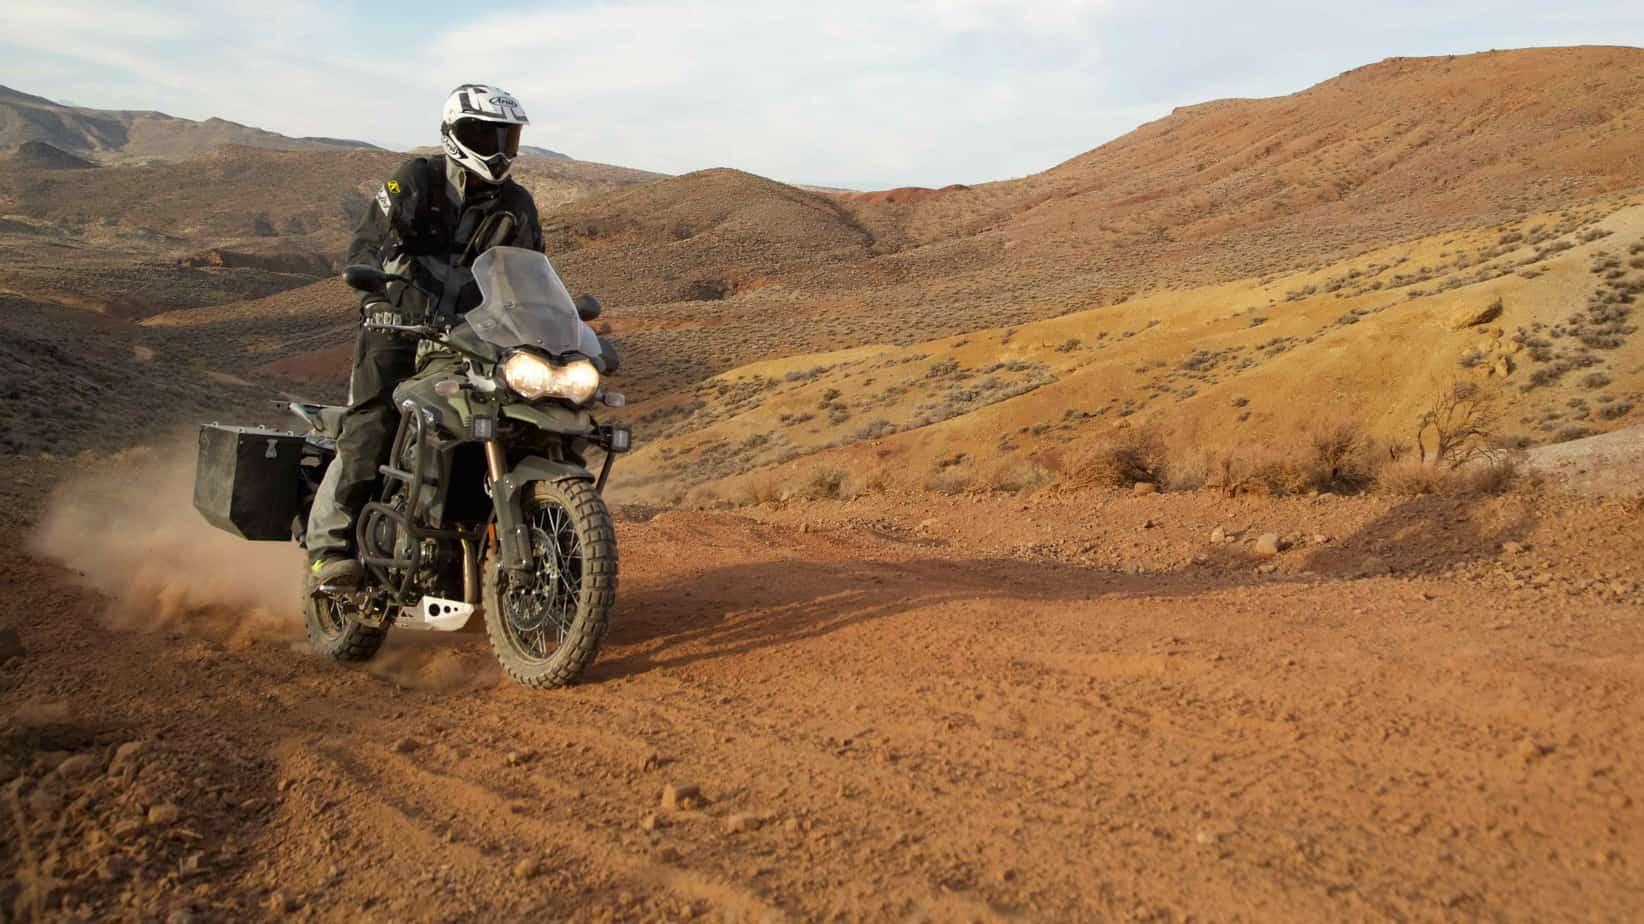 Top Ten Considerations for Adventure Motorcycle Prep